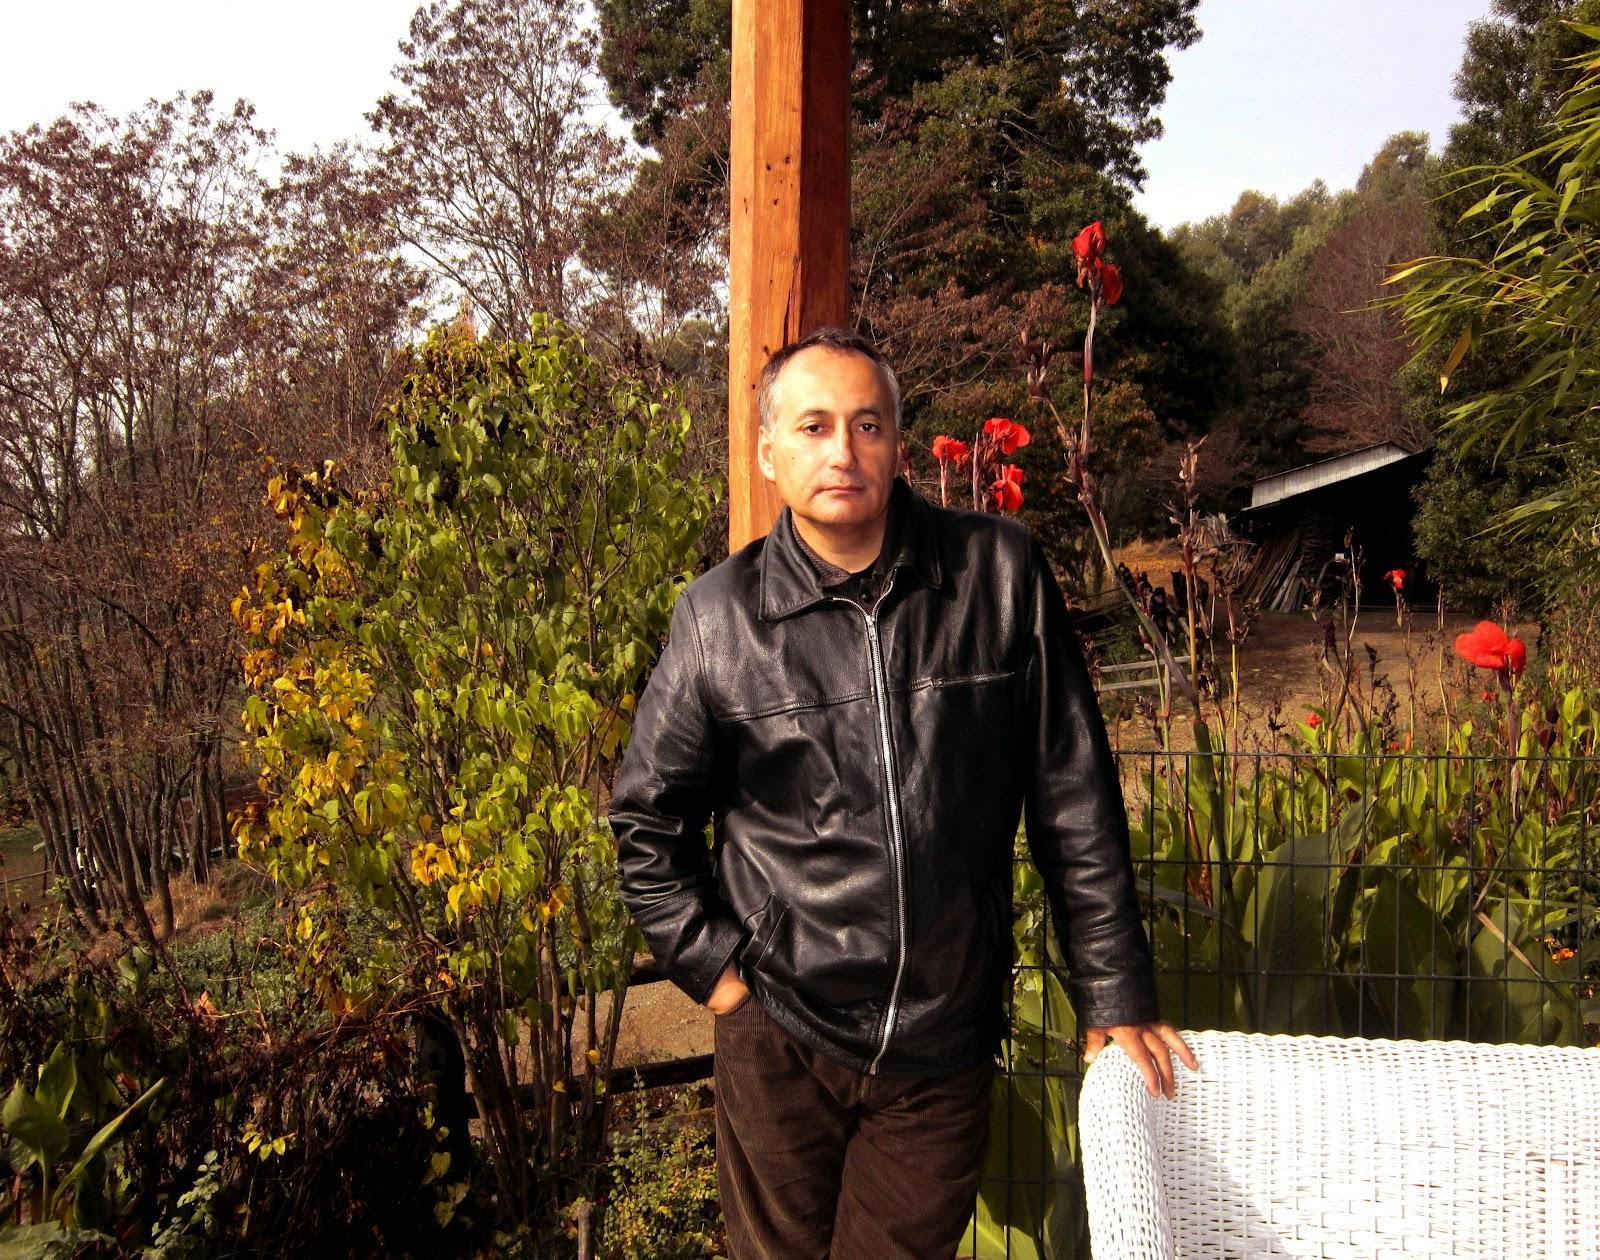 https://i2.wp.com/2.bp.blogspot.com/-dmudg5RiqTY/UAHZFhWkWEI/AAAAAAAAFig/A74Ia7RvXPY/s1600/Adolfo+Vasquez+Rocca+_+Los+Angeles+_+Sur+_+2012+_+1++C.jpeg